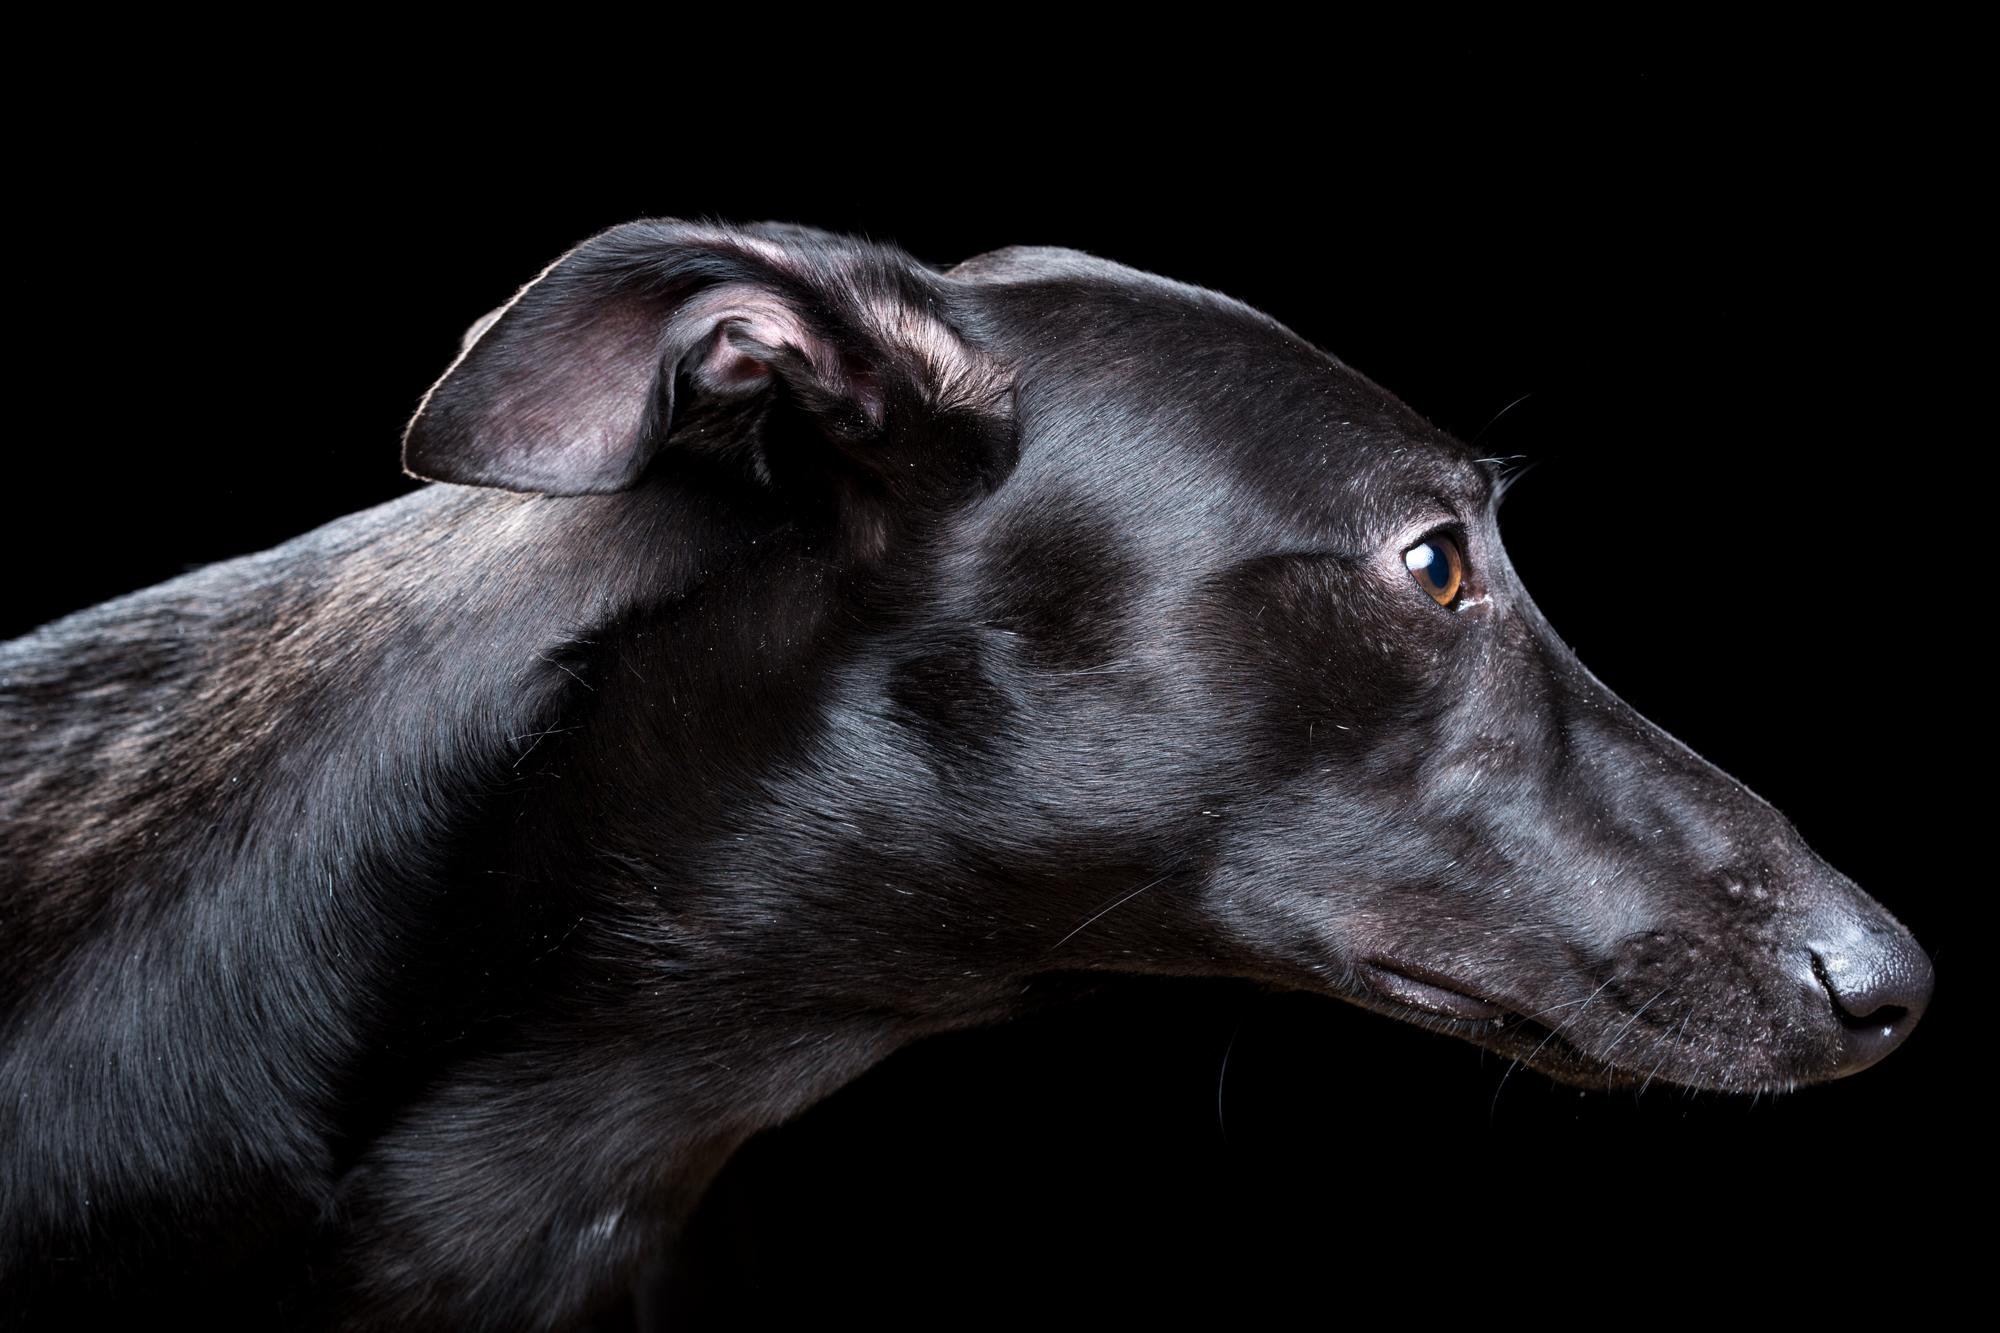 Hugo [1M] (Greyhound) 1031.jpg